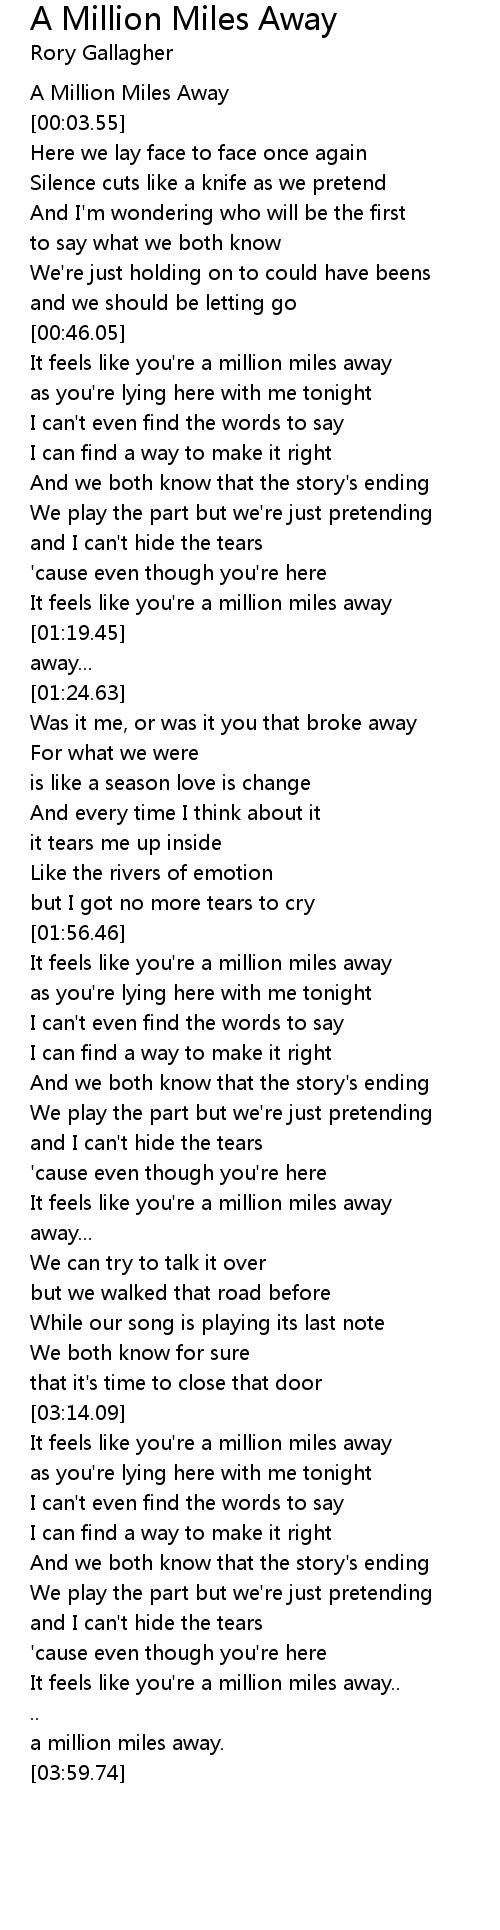 We Both Know Lyrics : lyrics, Million, Miles, Lyrics, Follow